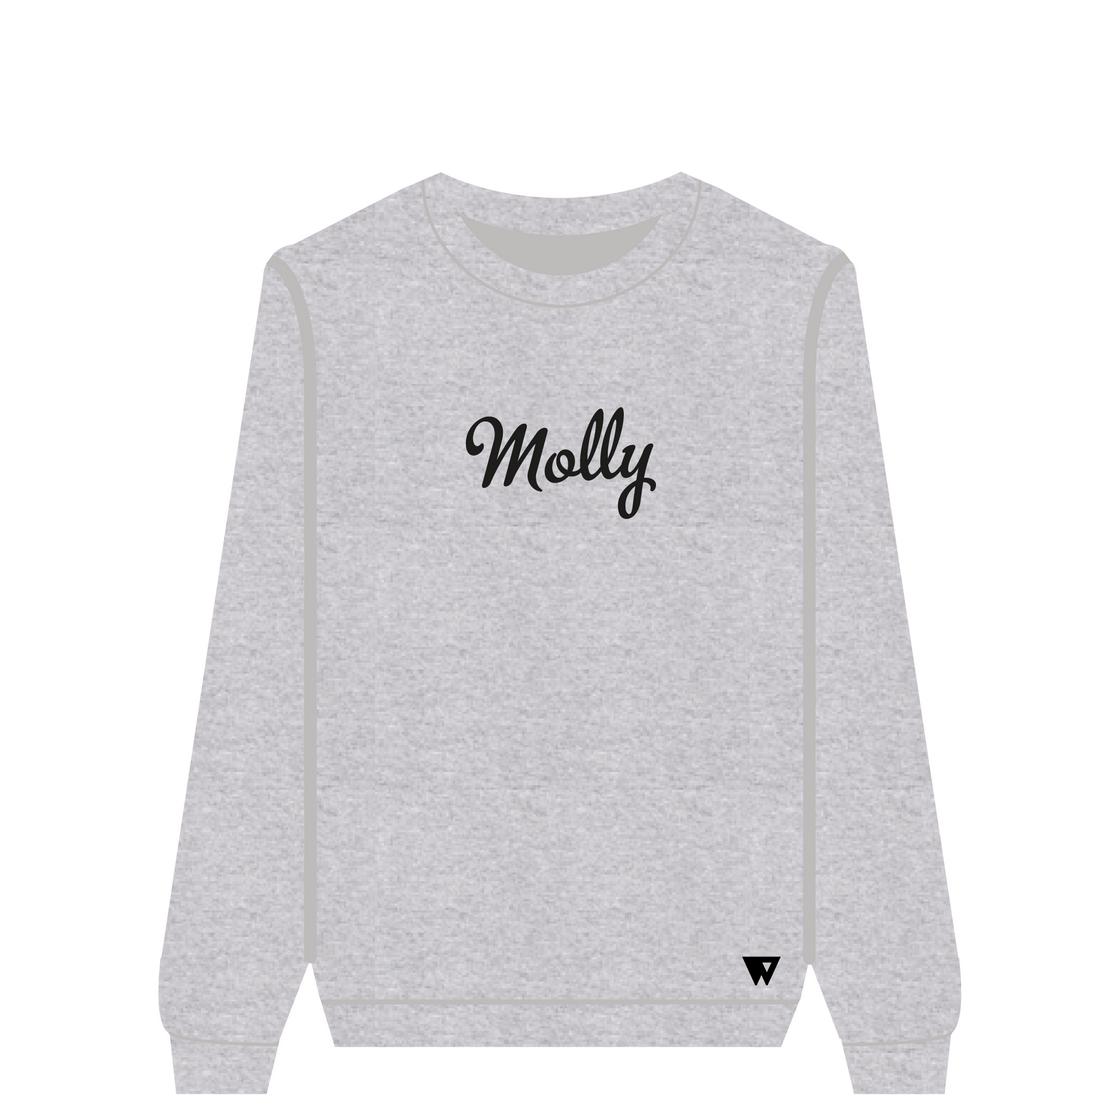 Sweatshirt Molly | Wuzzee